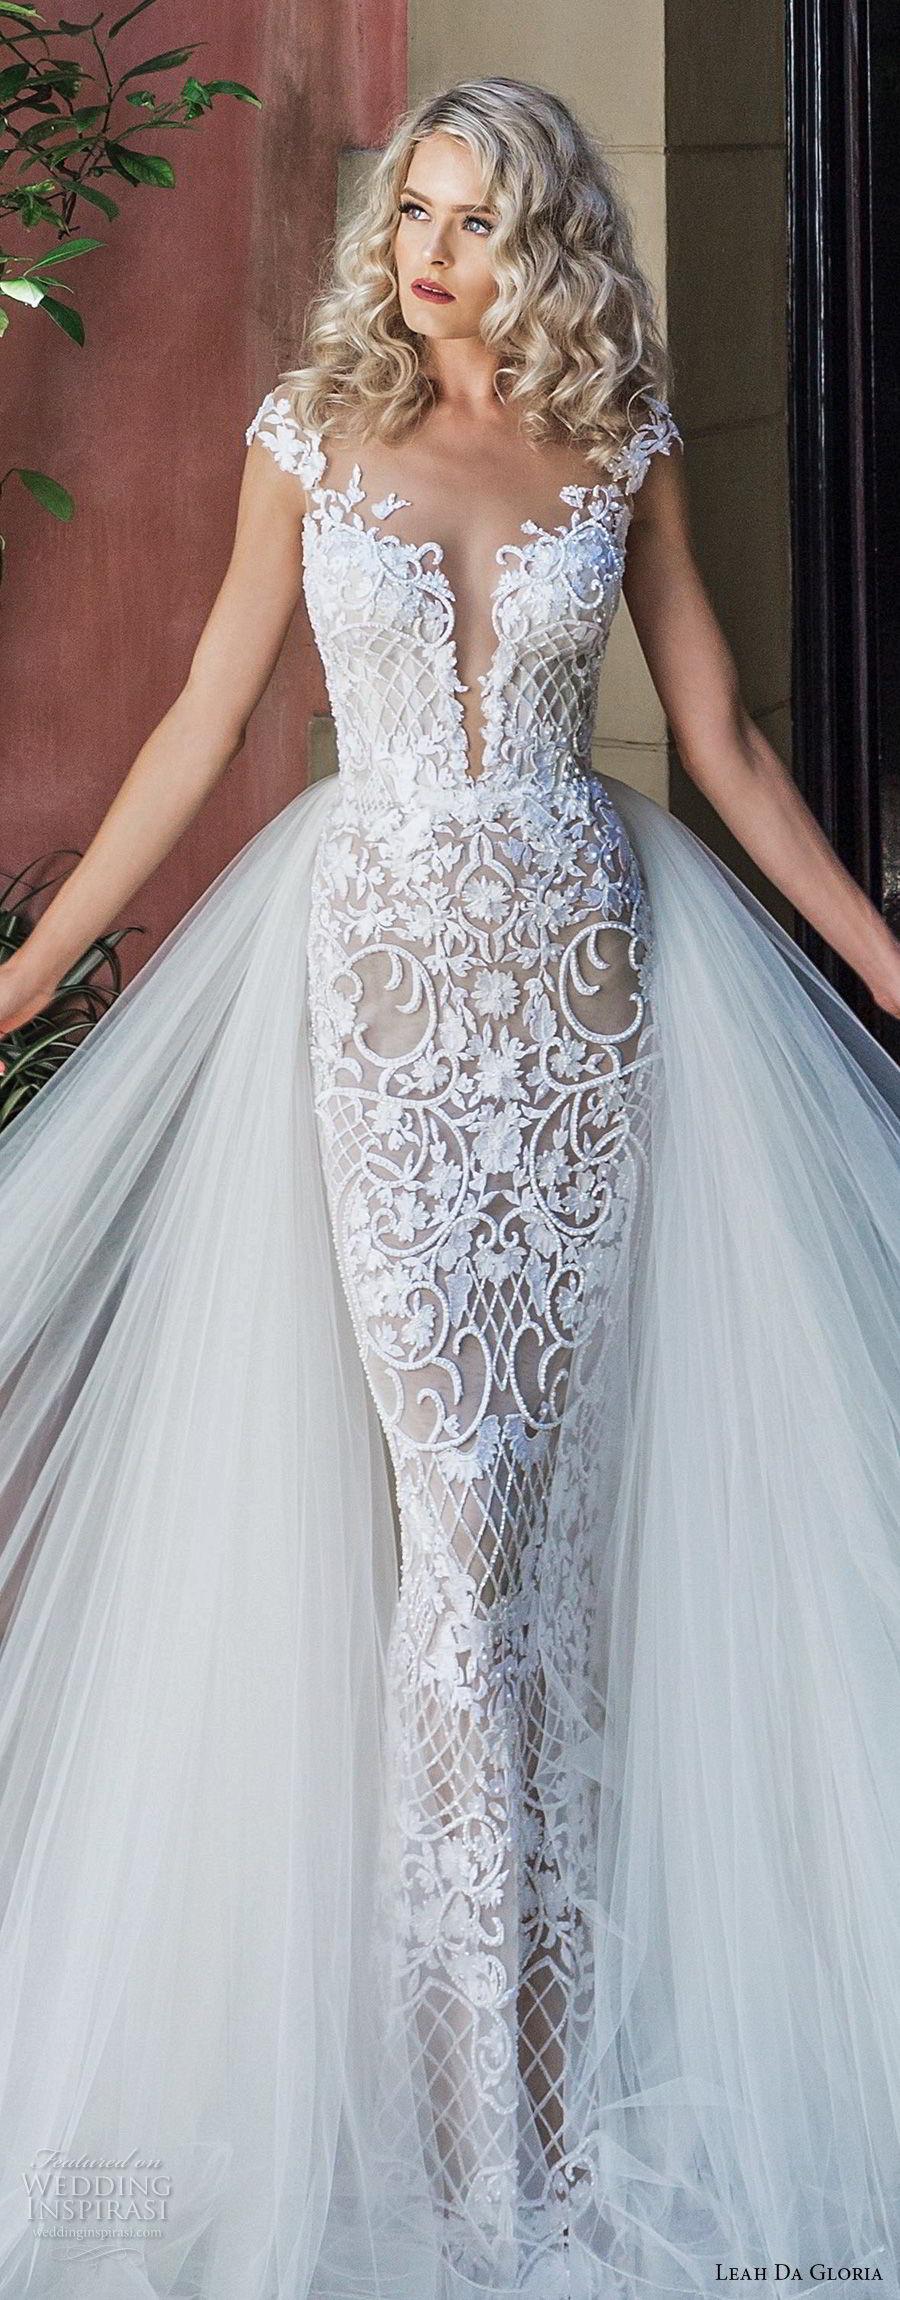 leah da gloria wedding dress price cheap online